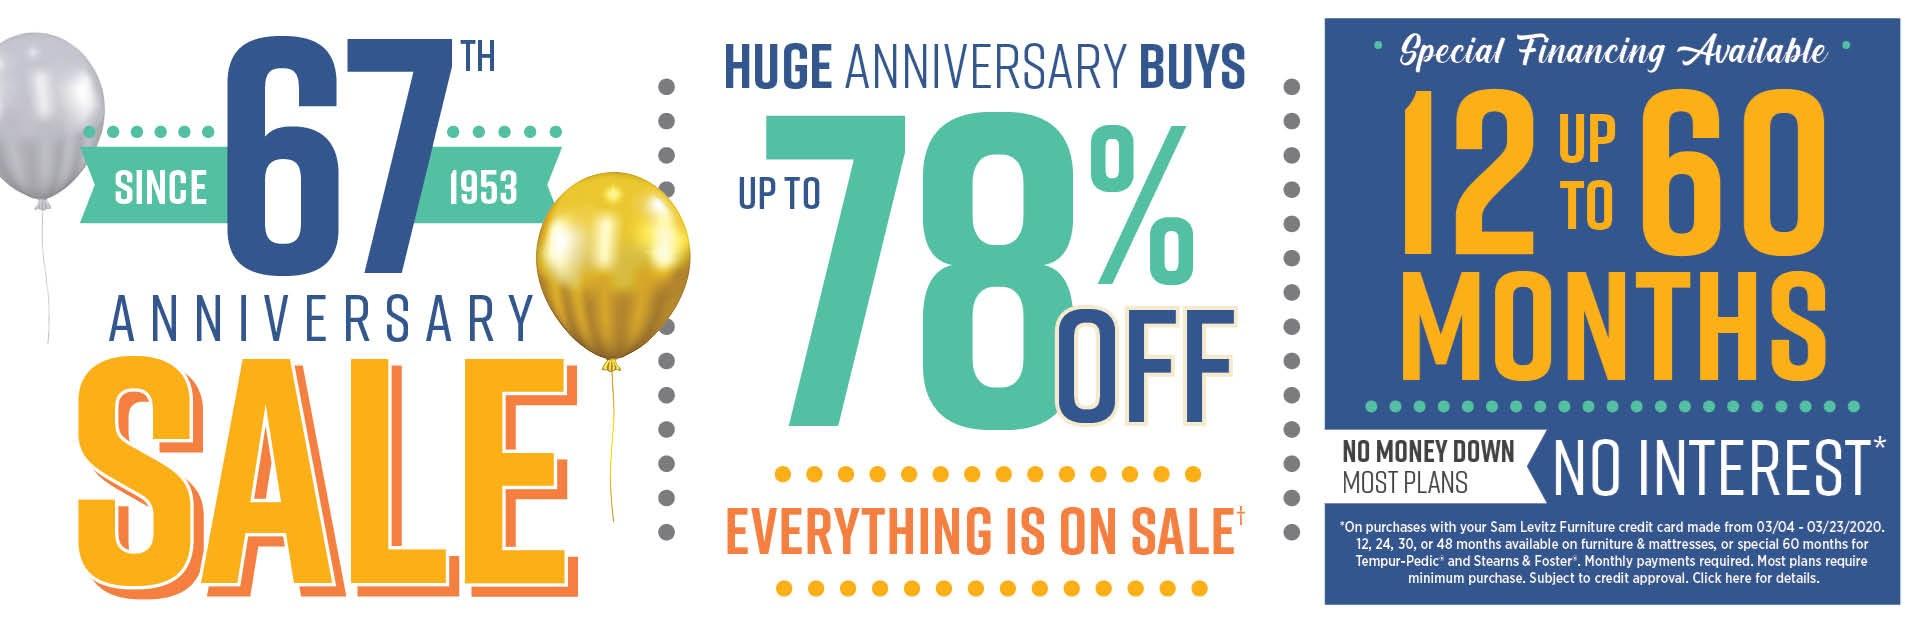 anniversary-sale-2020